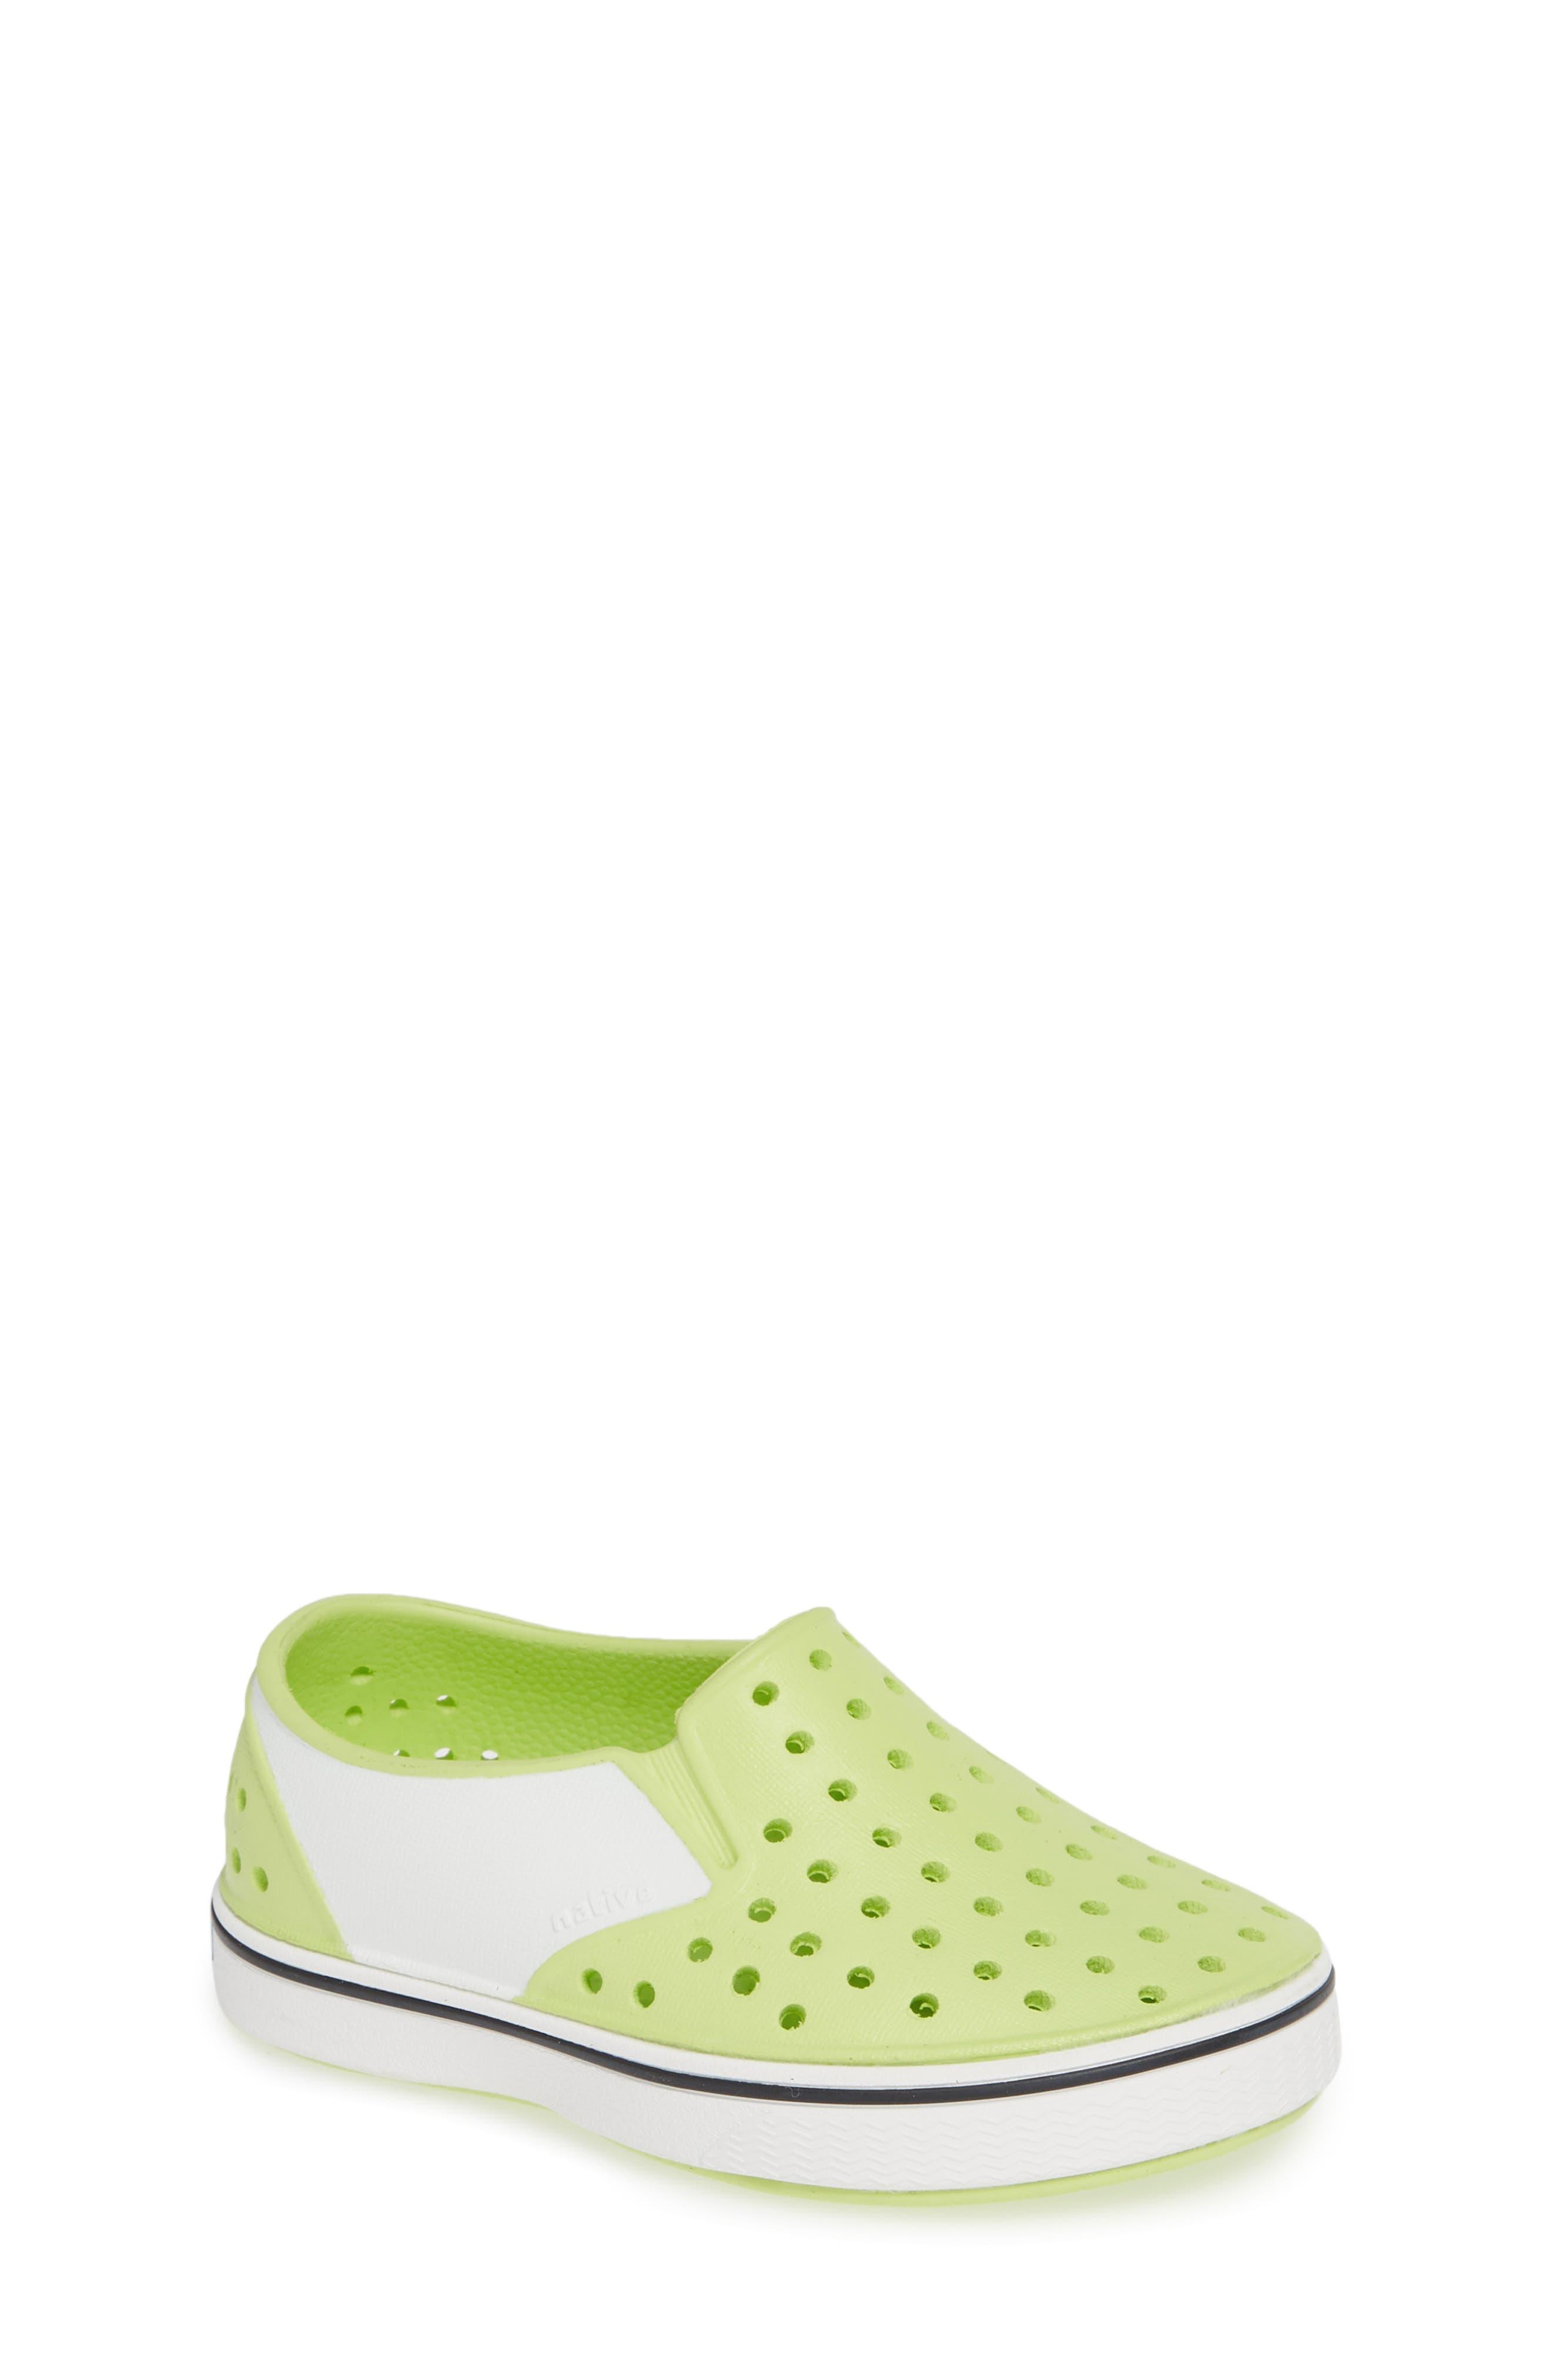 Miles Colorblock Slip-On Sneaker,                             Main thumbnail 1, color,                             SUNNY GREEN/ SHELL WHITE